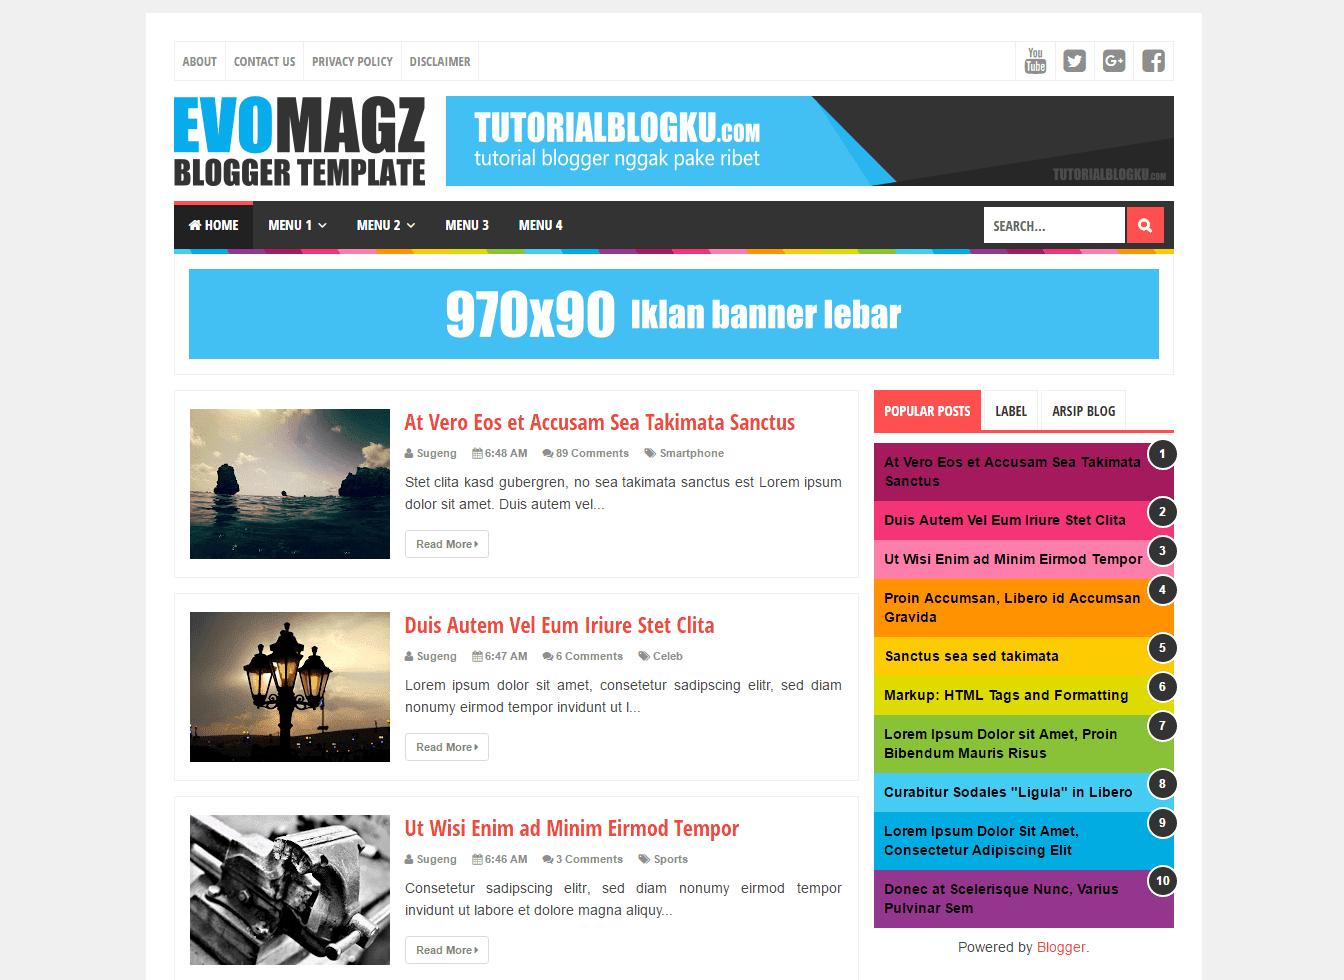 Template responsive evomagz, Evomagz blogger template, Seo friendly & Responsive Evomagz Template